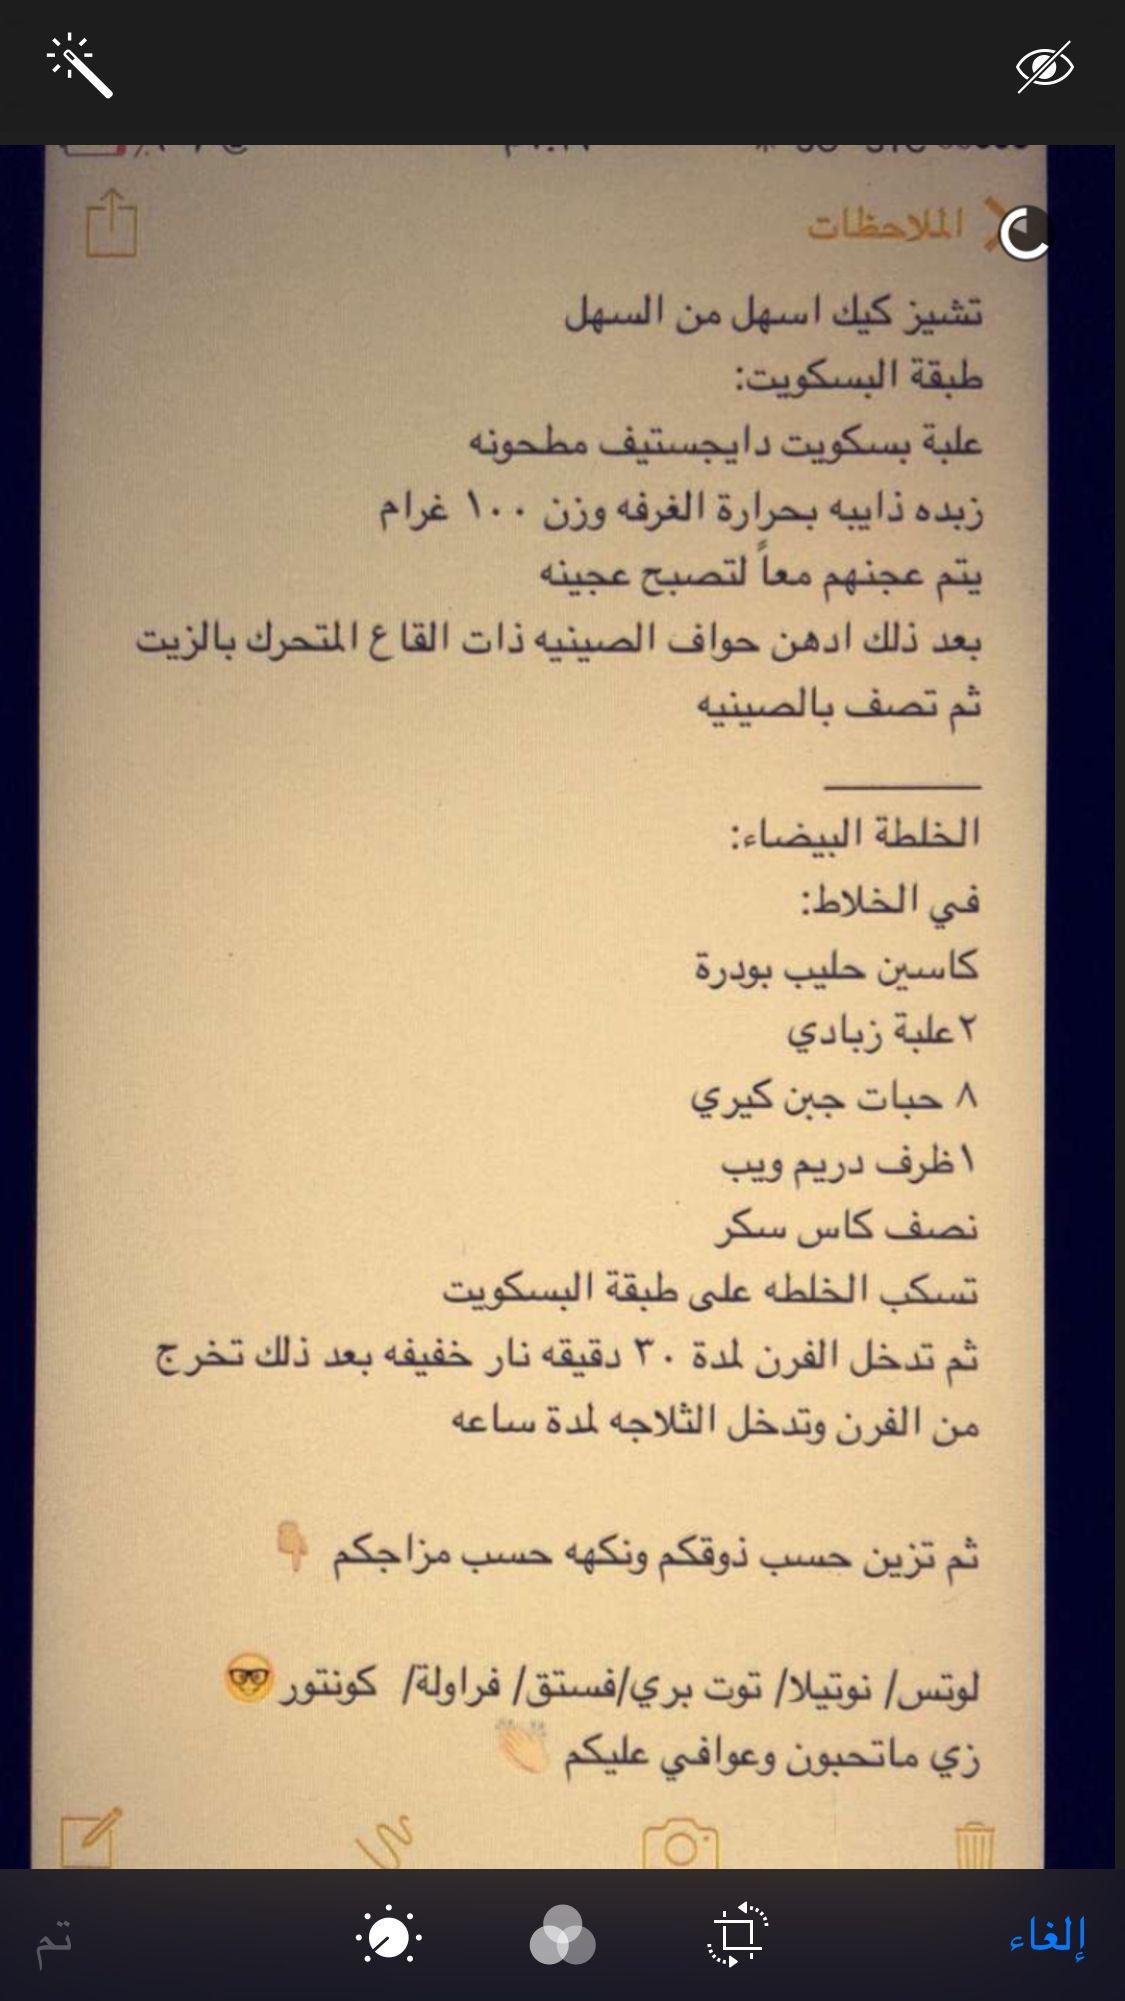 تشيز كيك سهل جدا Food Recipies Algerian Recipes Arabic Food